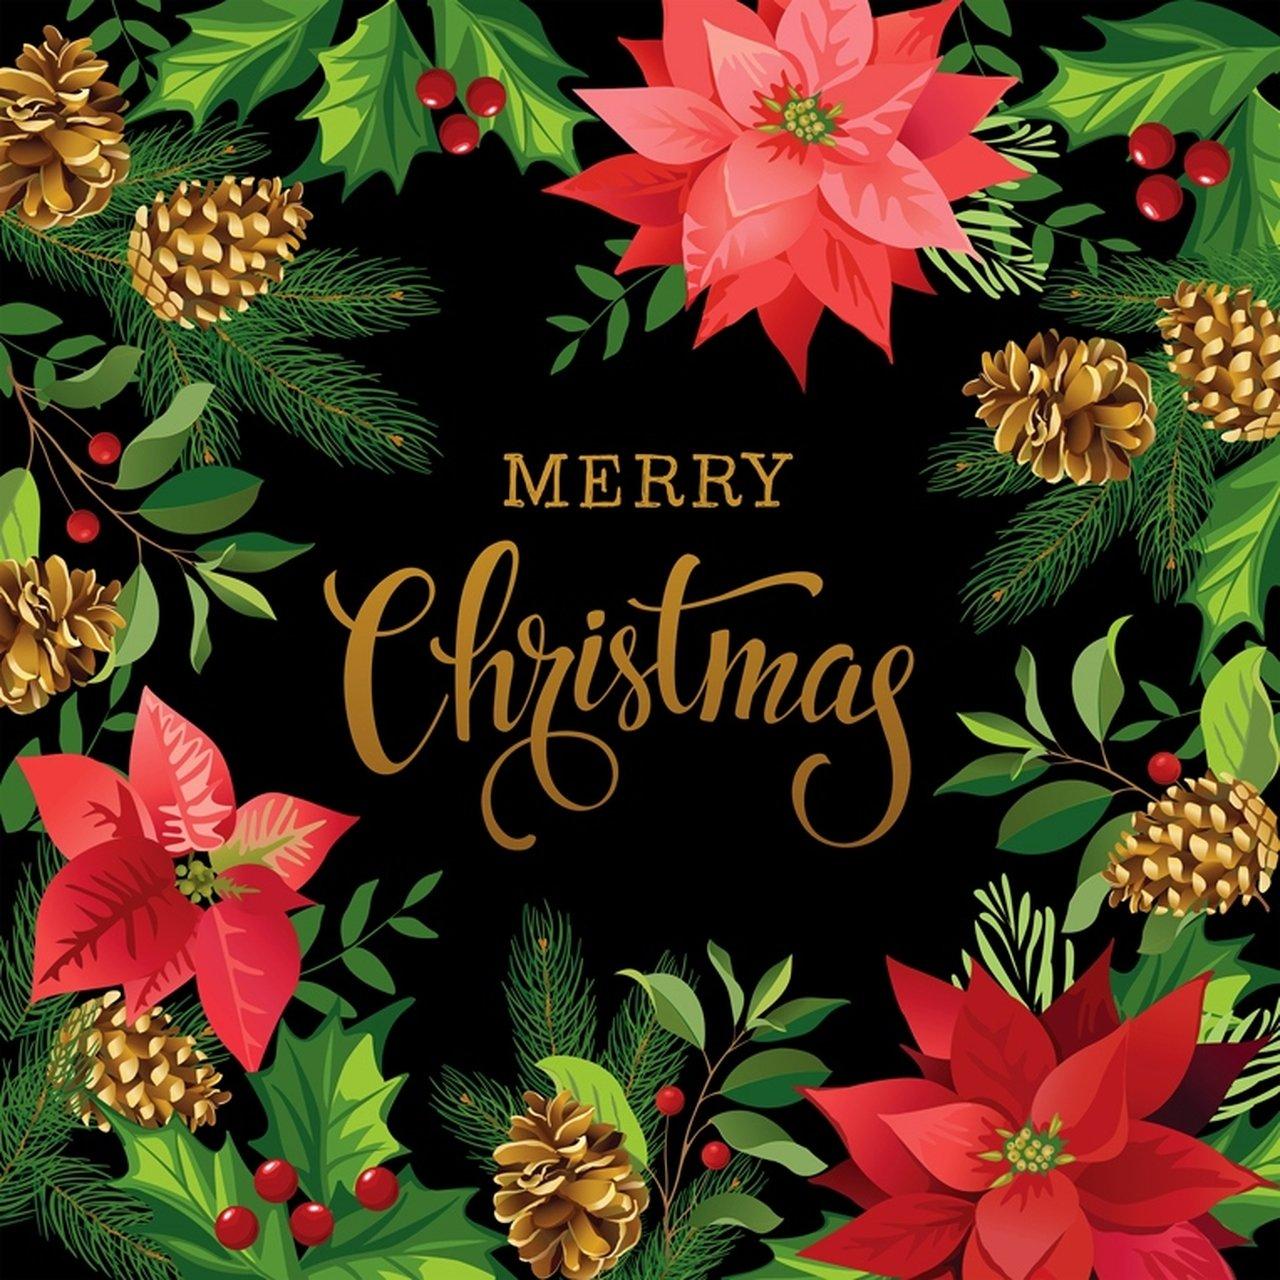 Gradients Holiday Poinsettia Christmas Digital Panel - Black